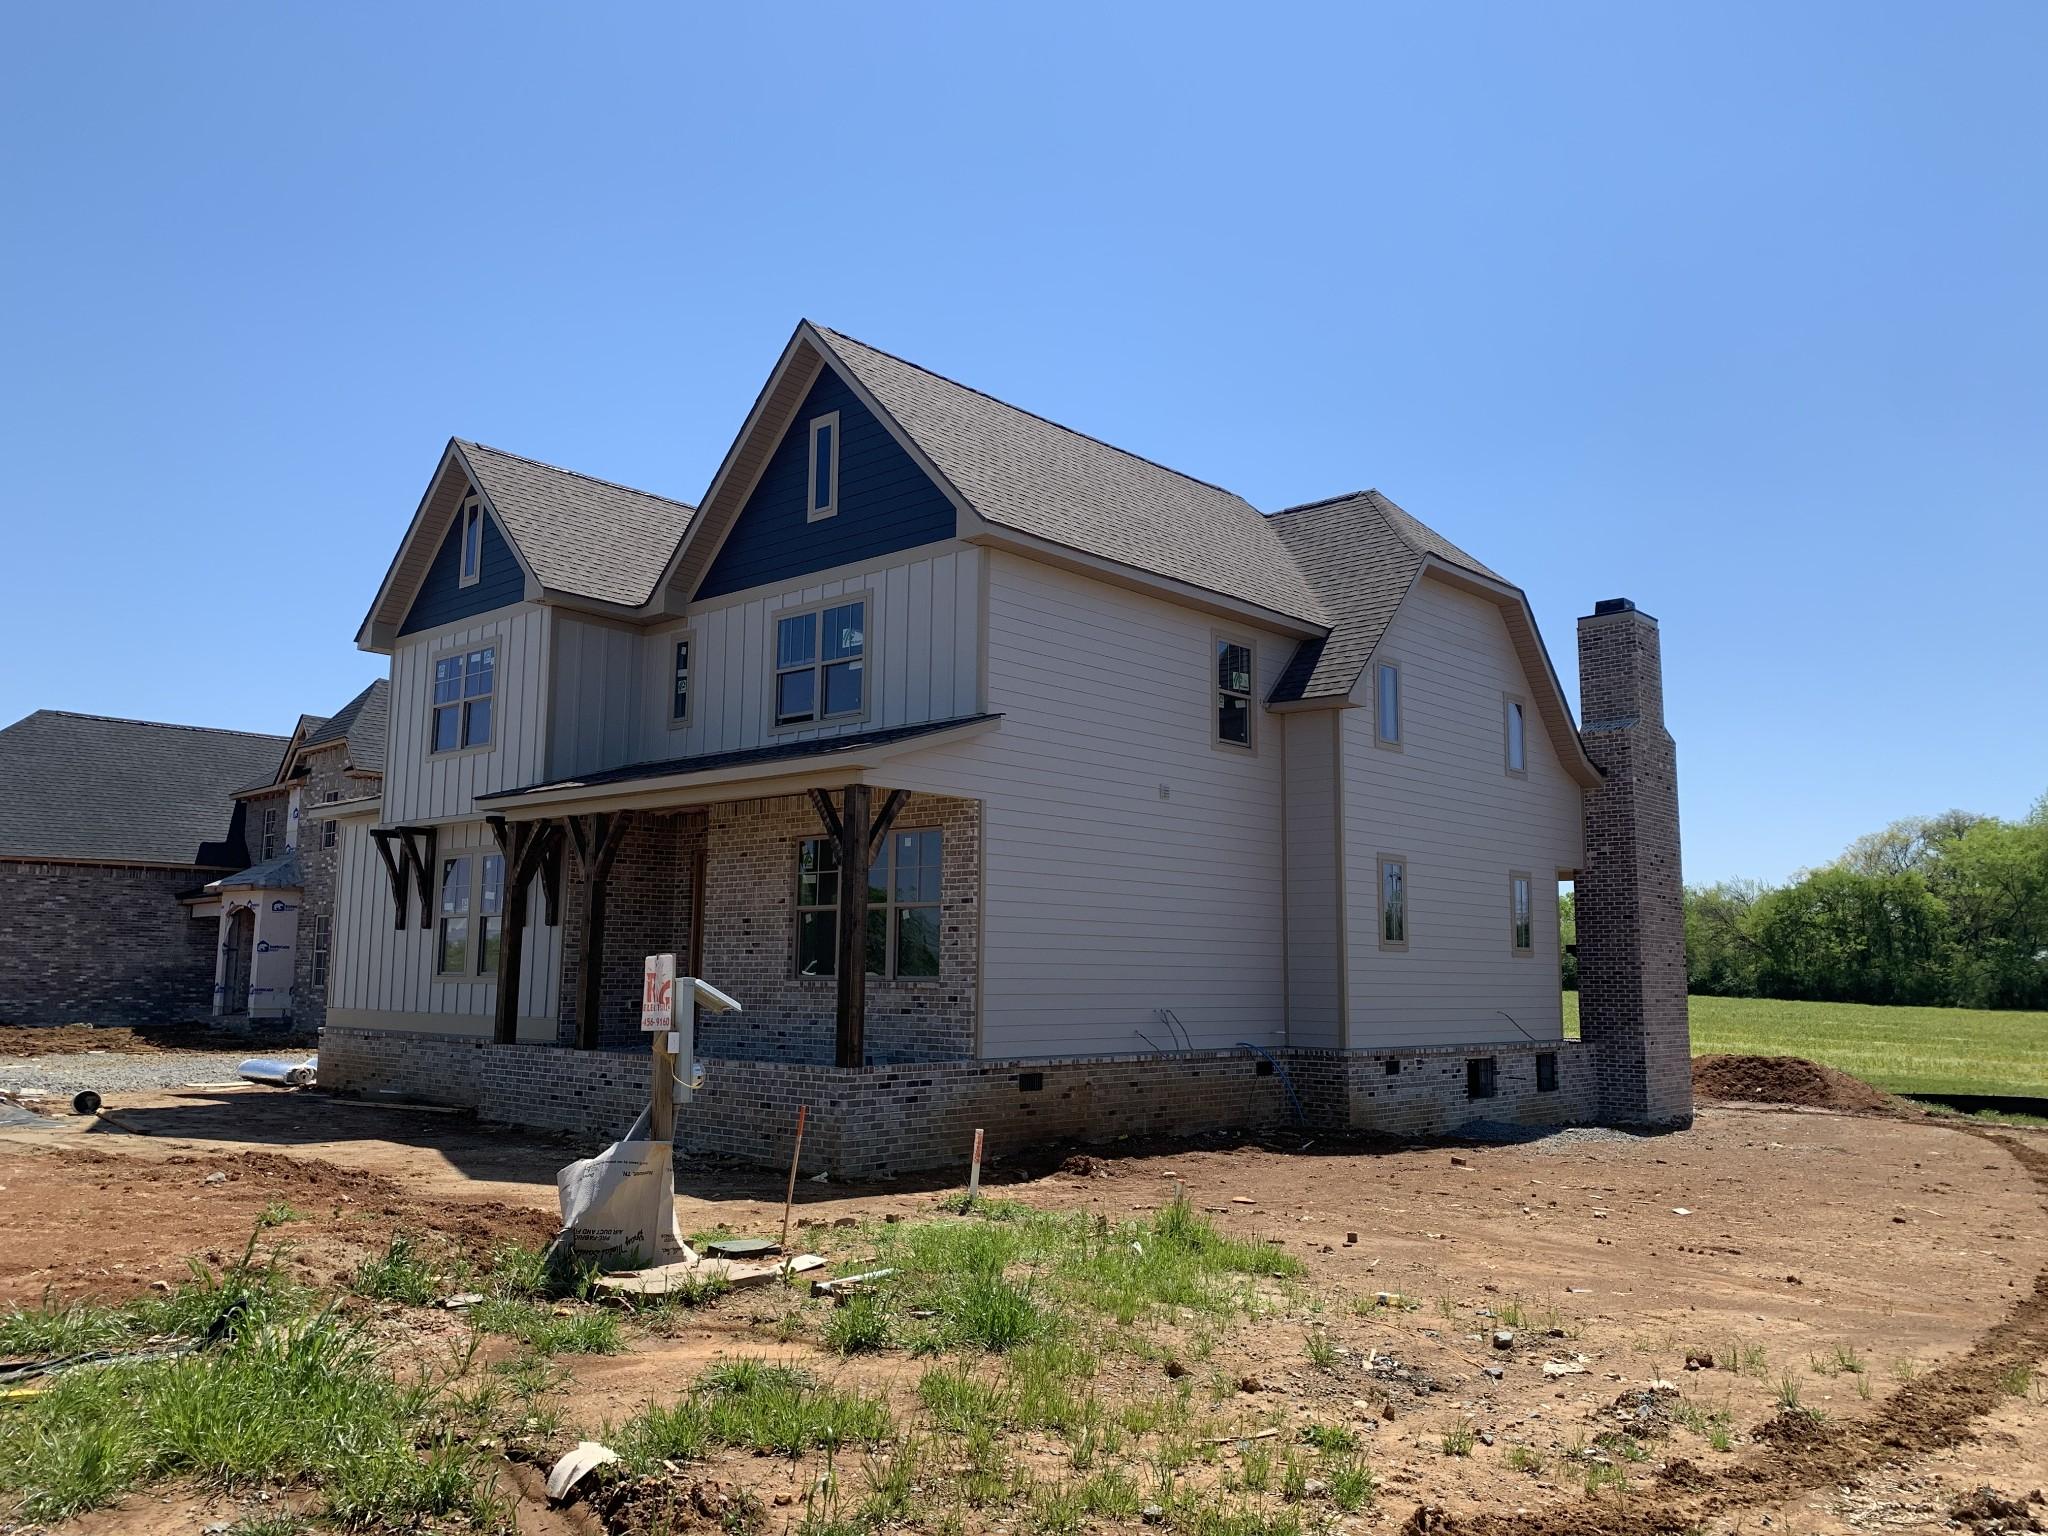 5725 Bridgemore Blvd, Murfreesboro, TN 37128 - Murfreesboro, TN real estate listing